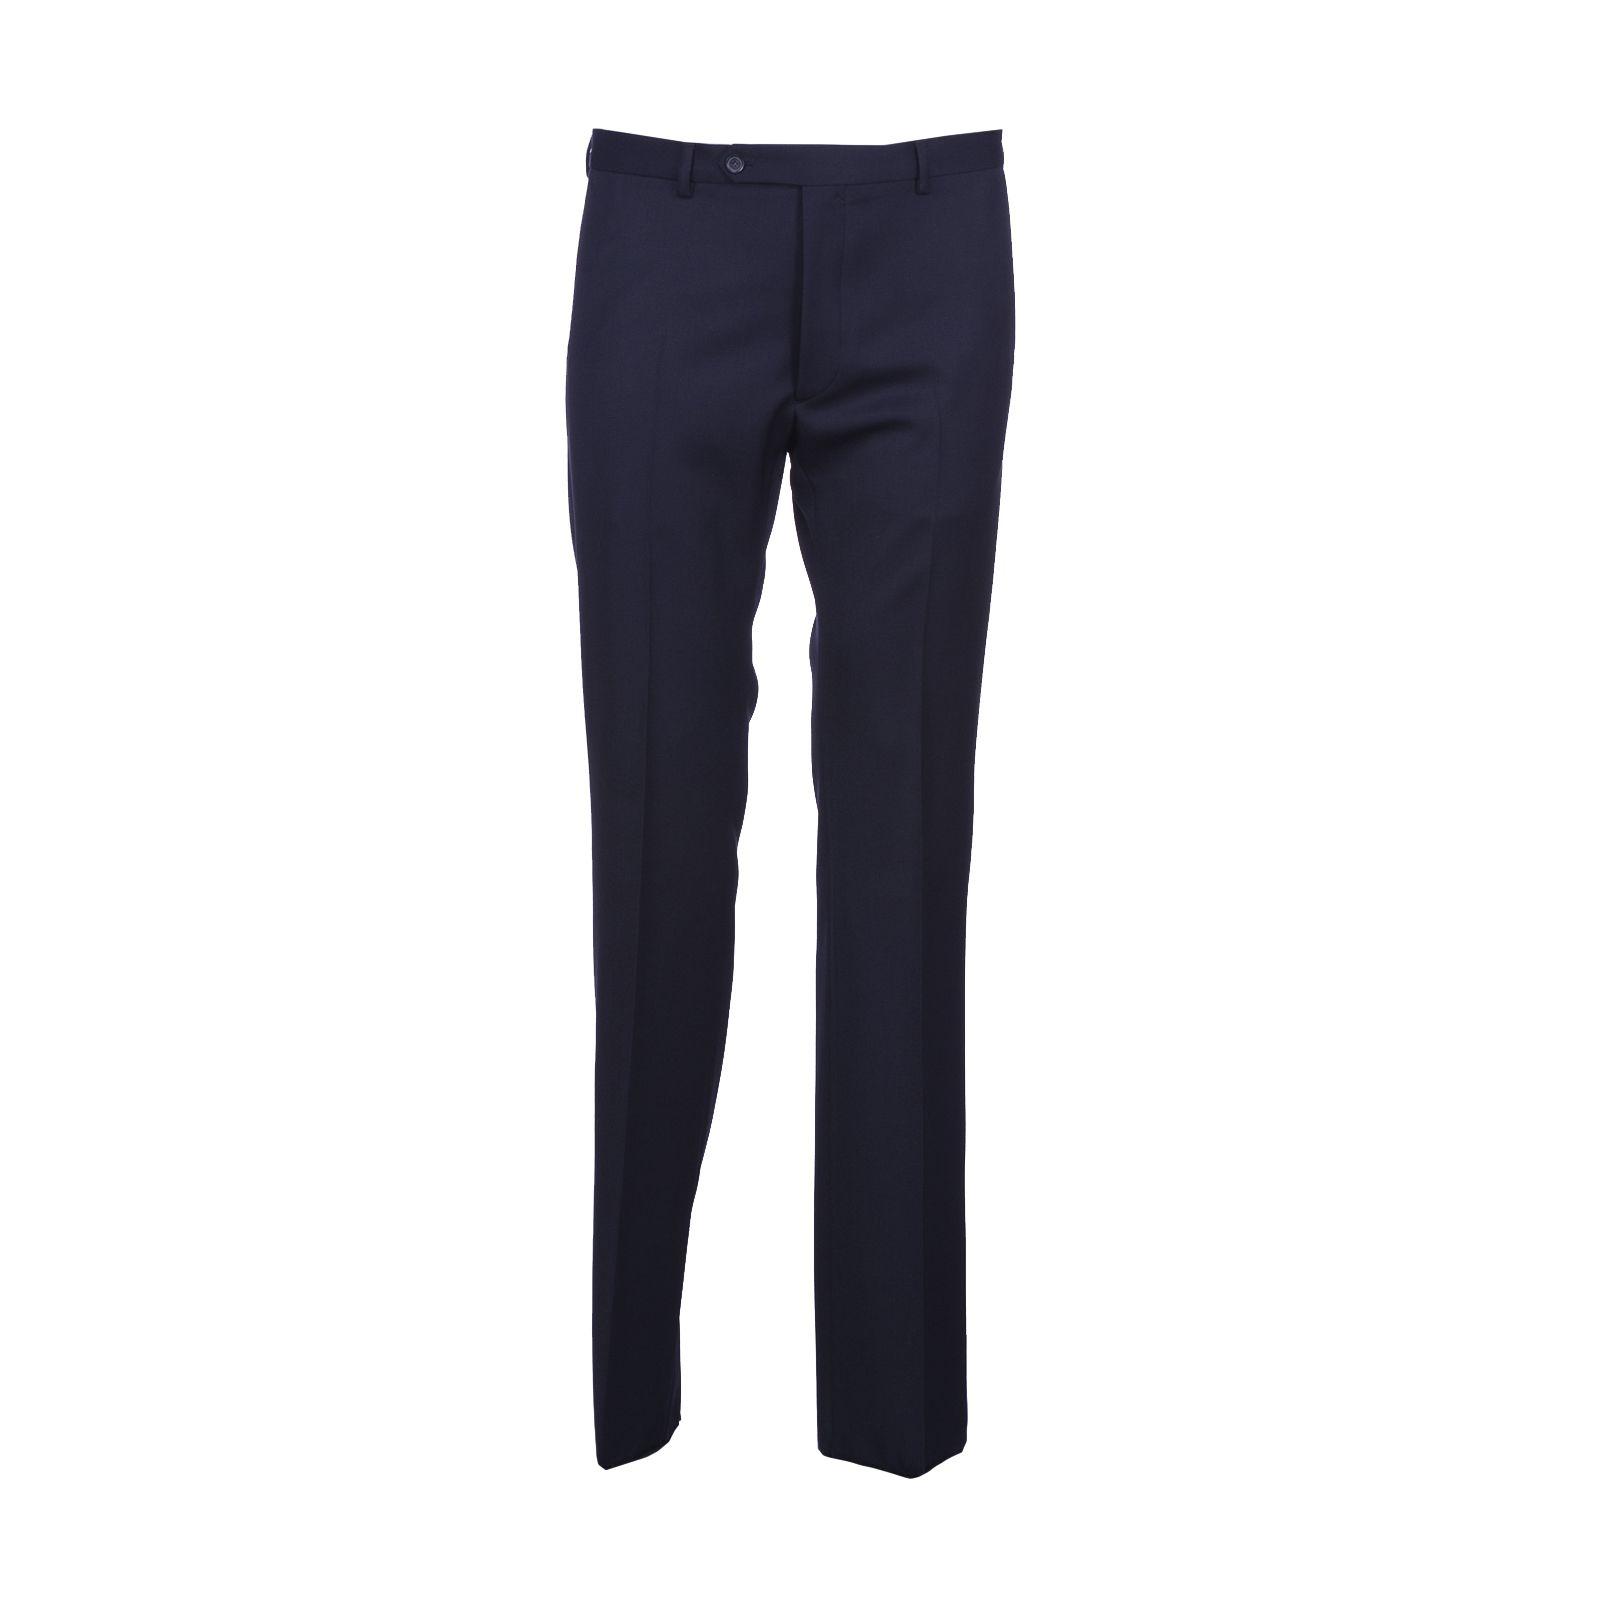 Valentino Garavani Tailored Pants